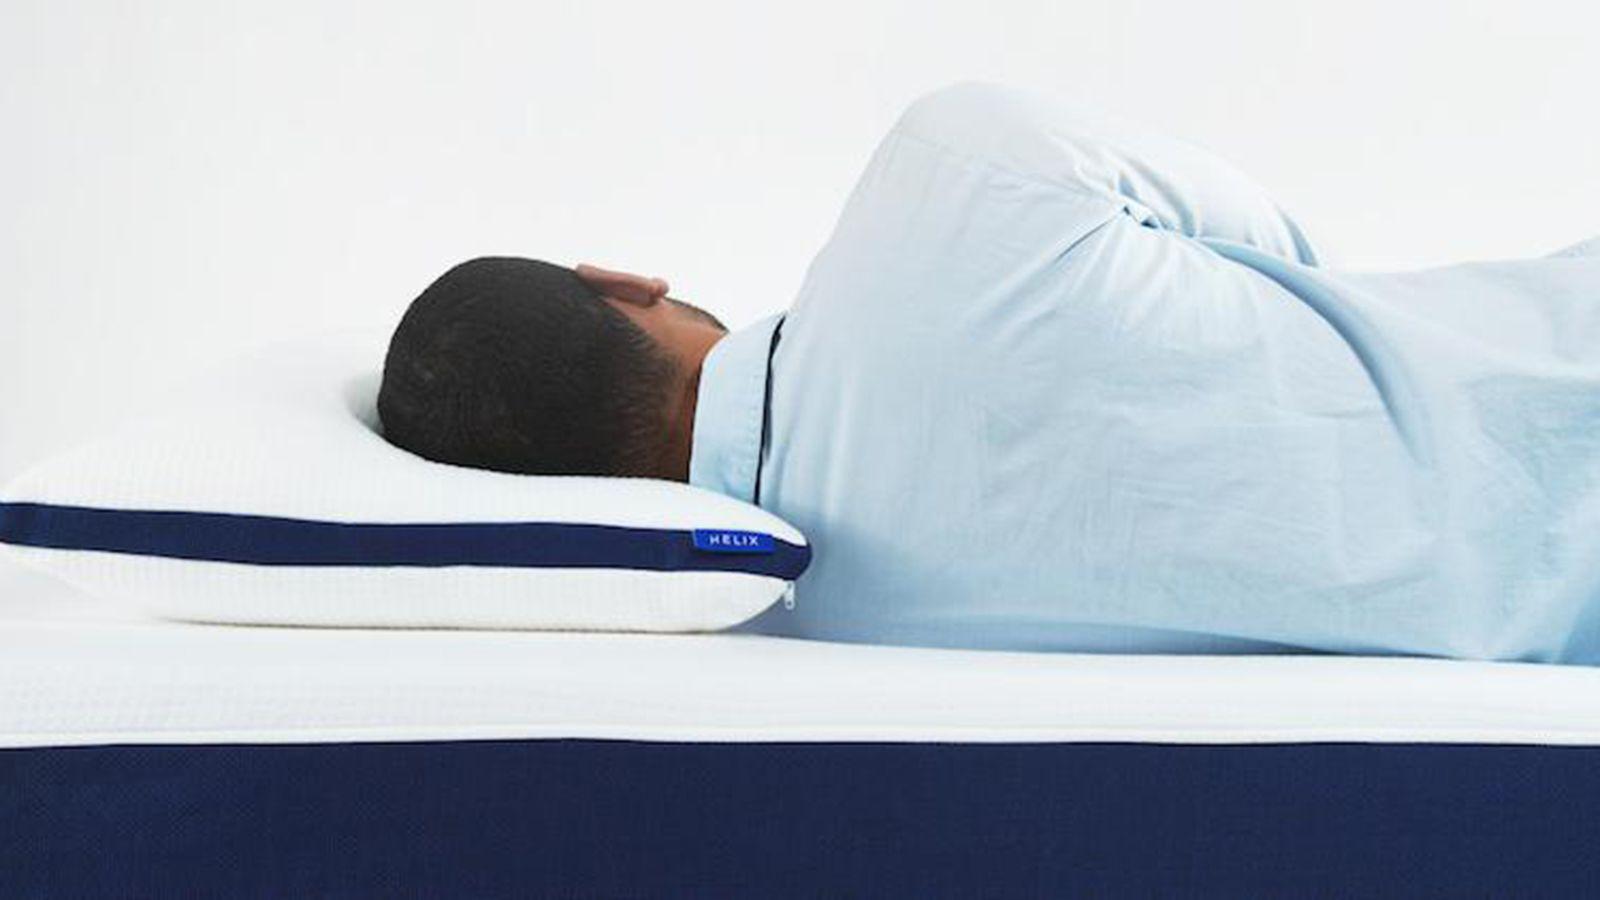 www.amazon.com/Knee-Pillow-Sleeping-Leg-Pain/dp/B07995B8L1/